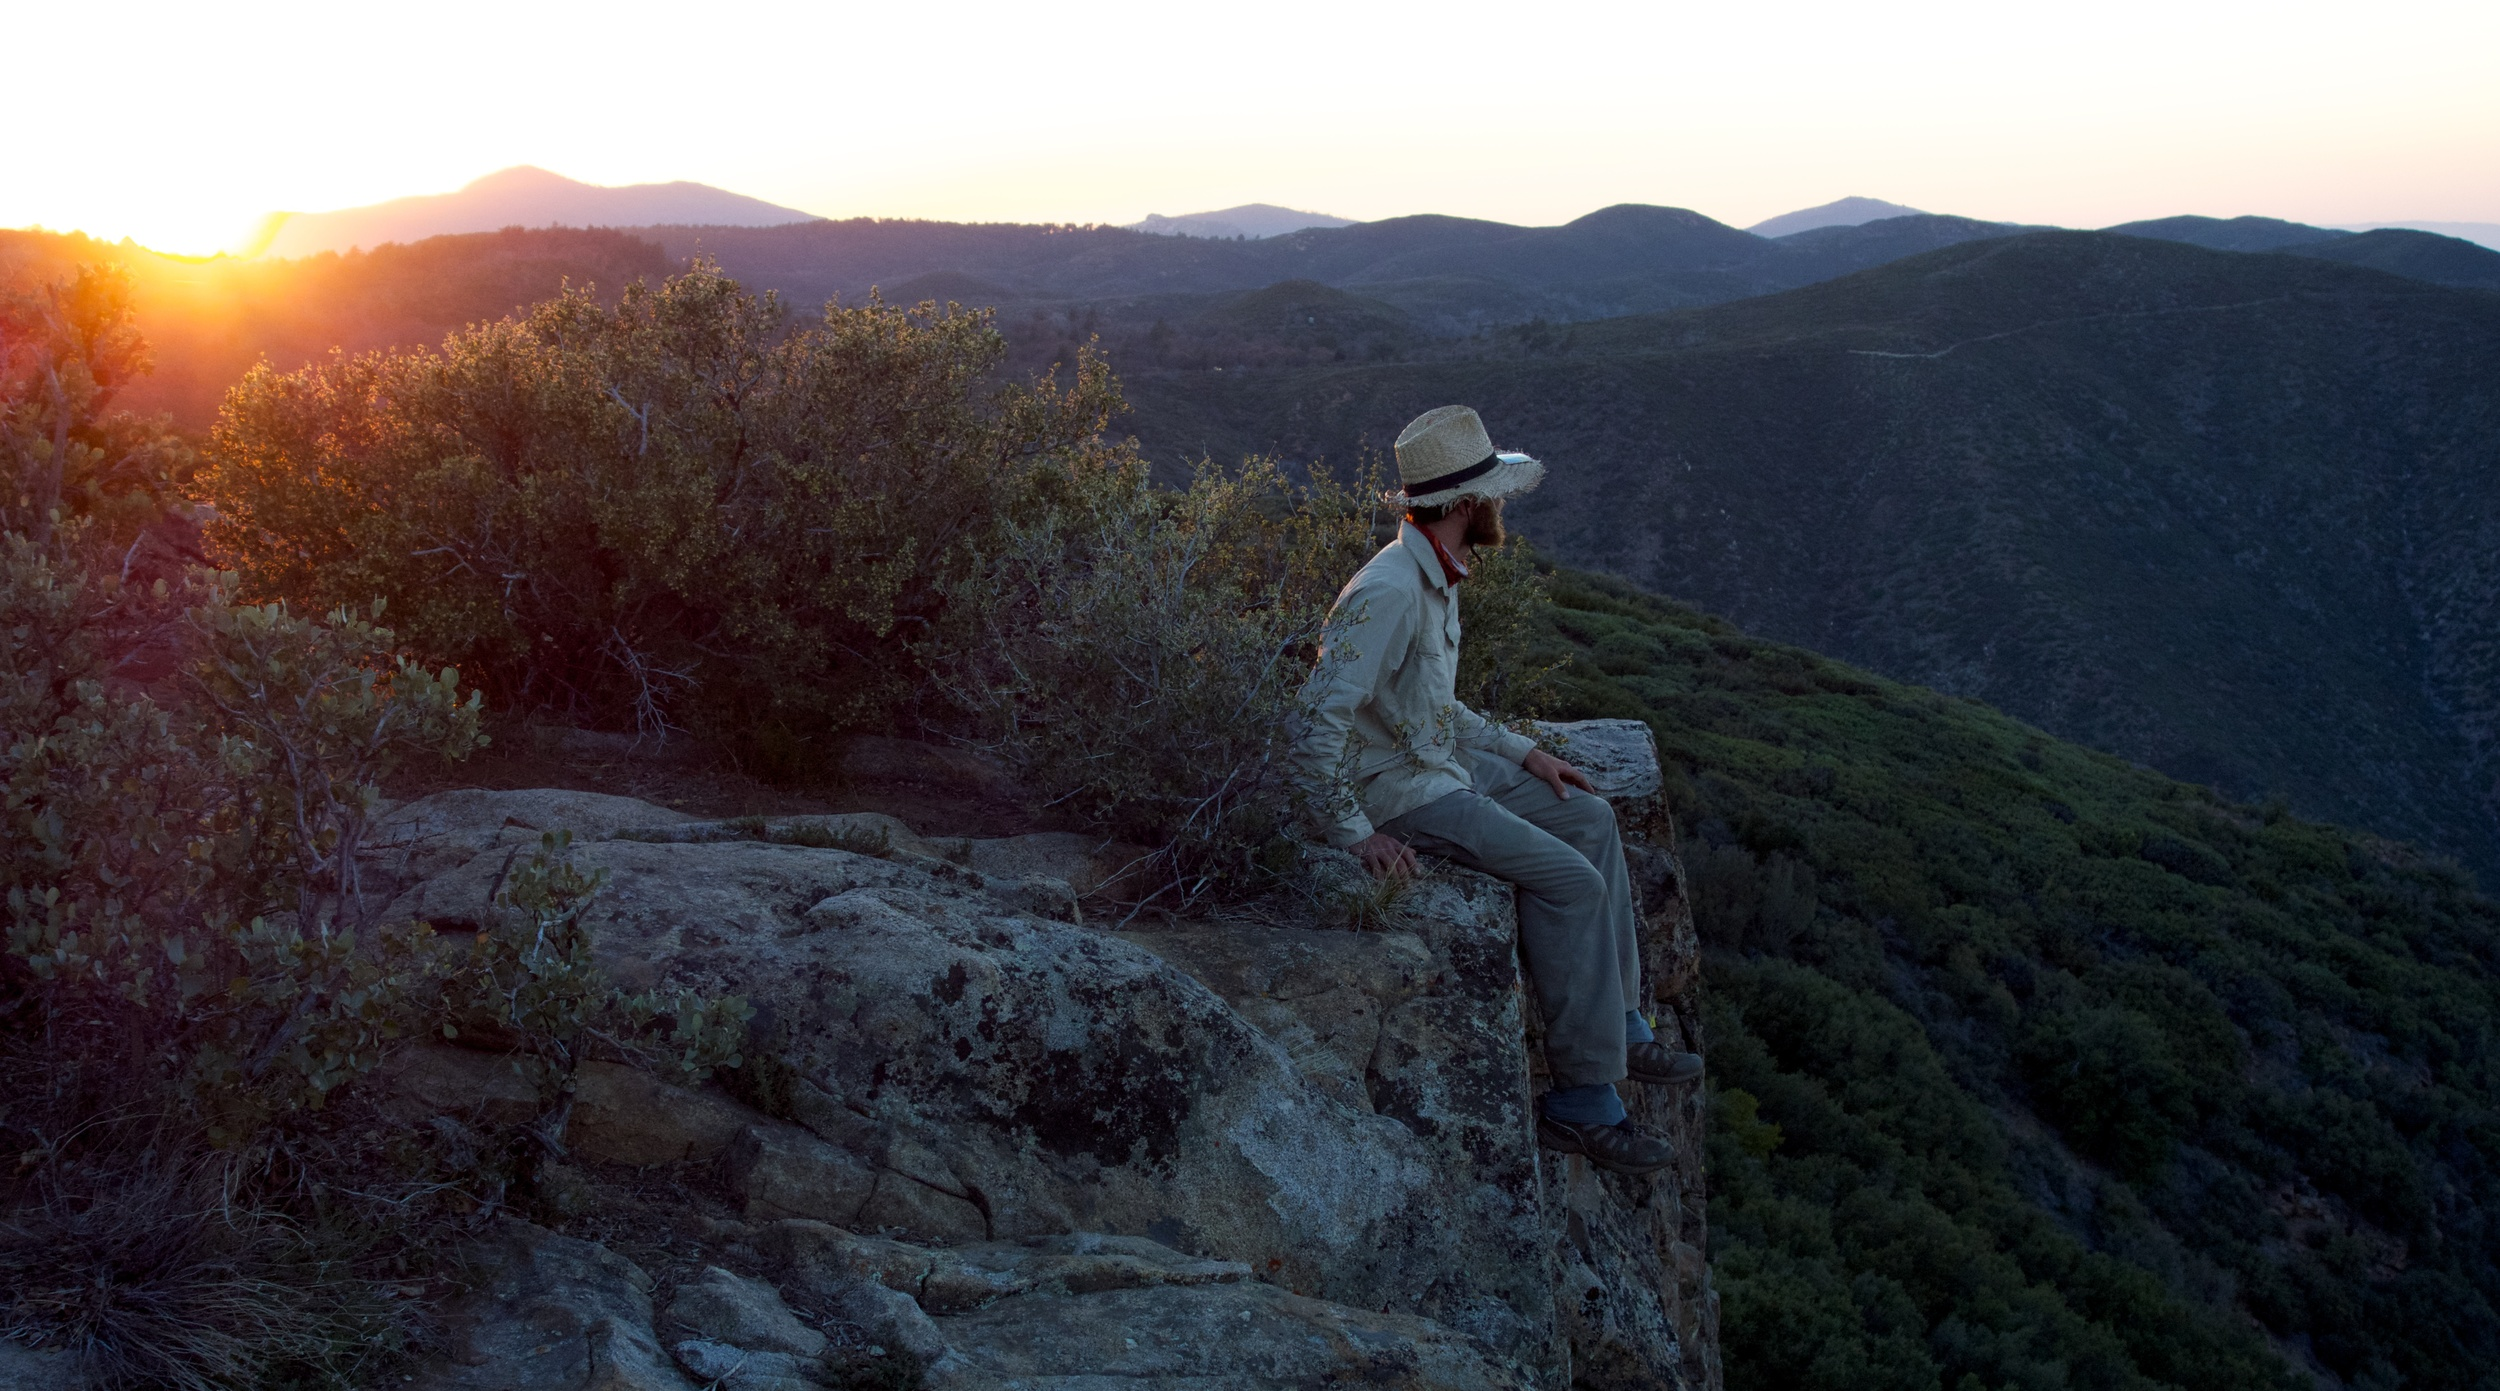 Sunset in the Laguna Mountains